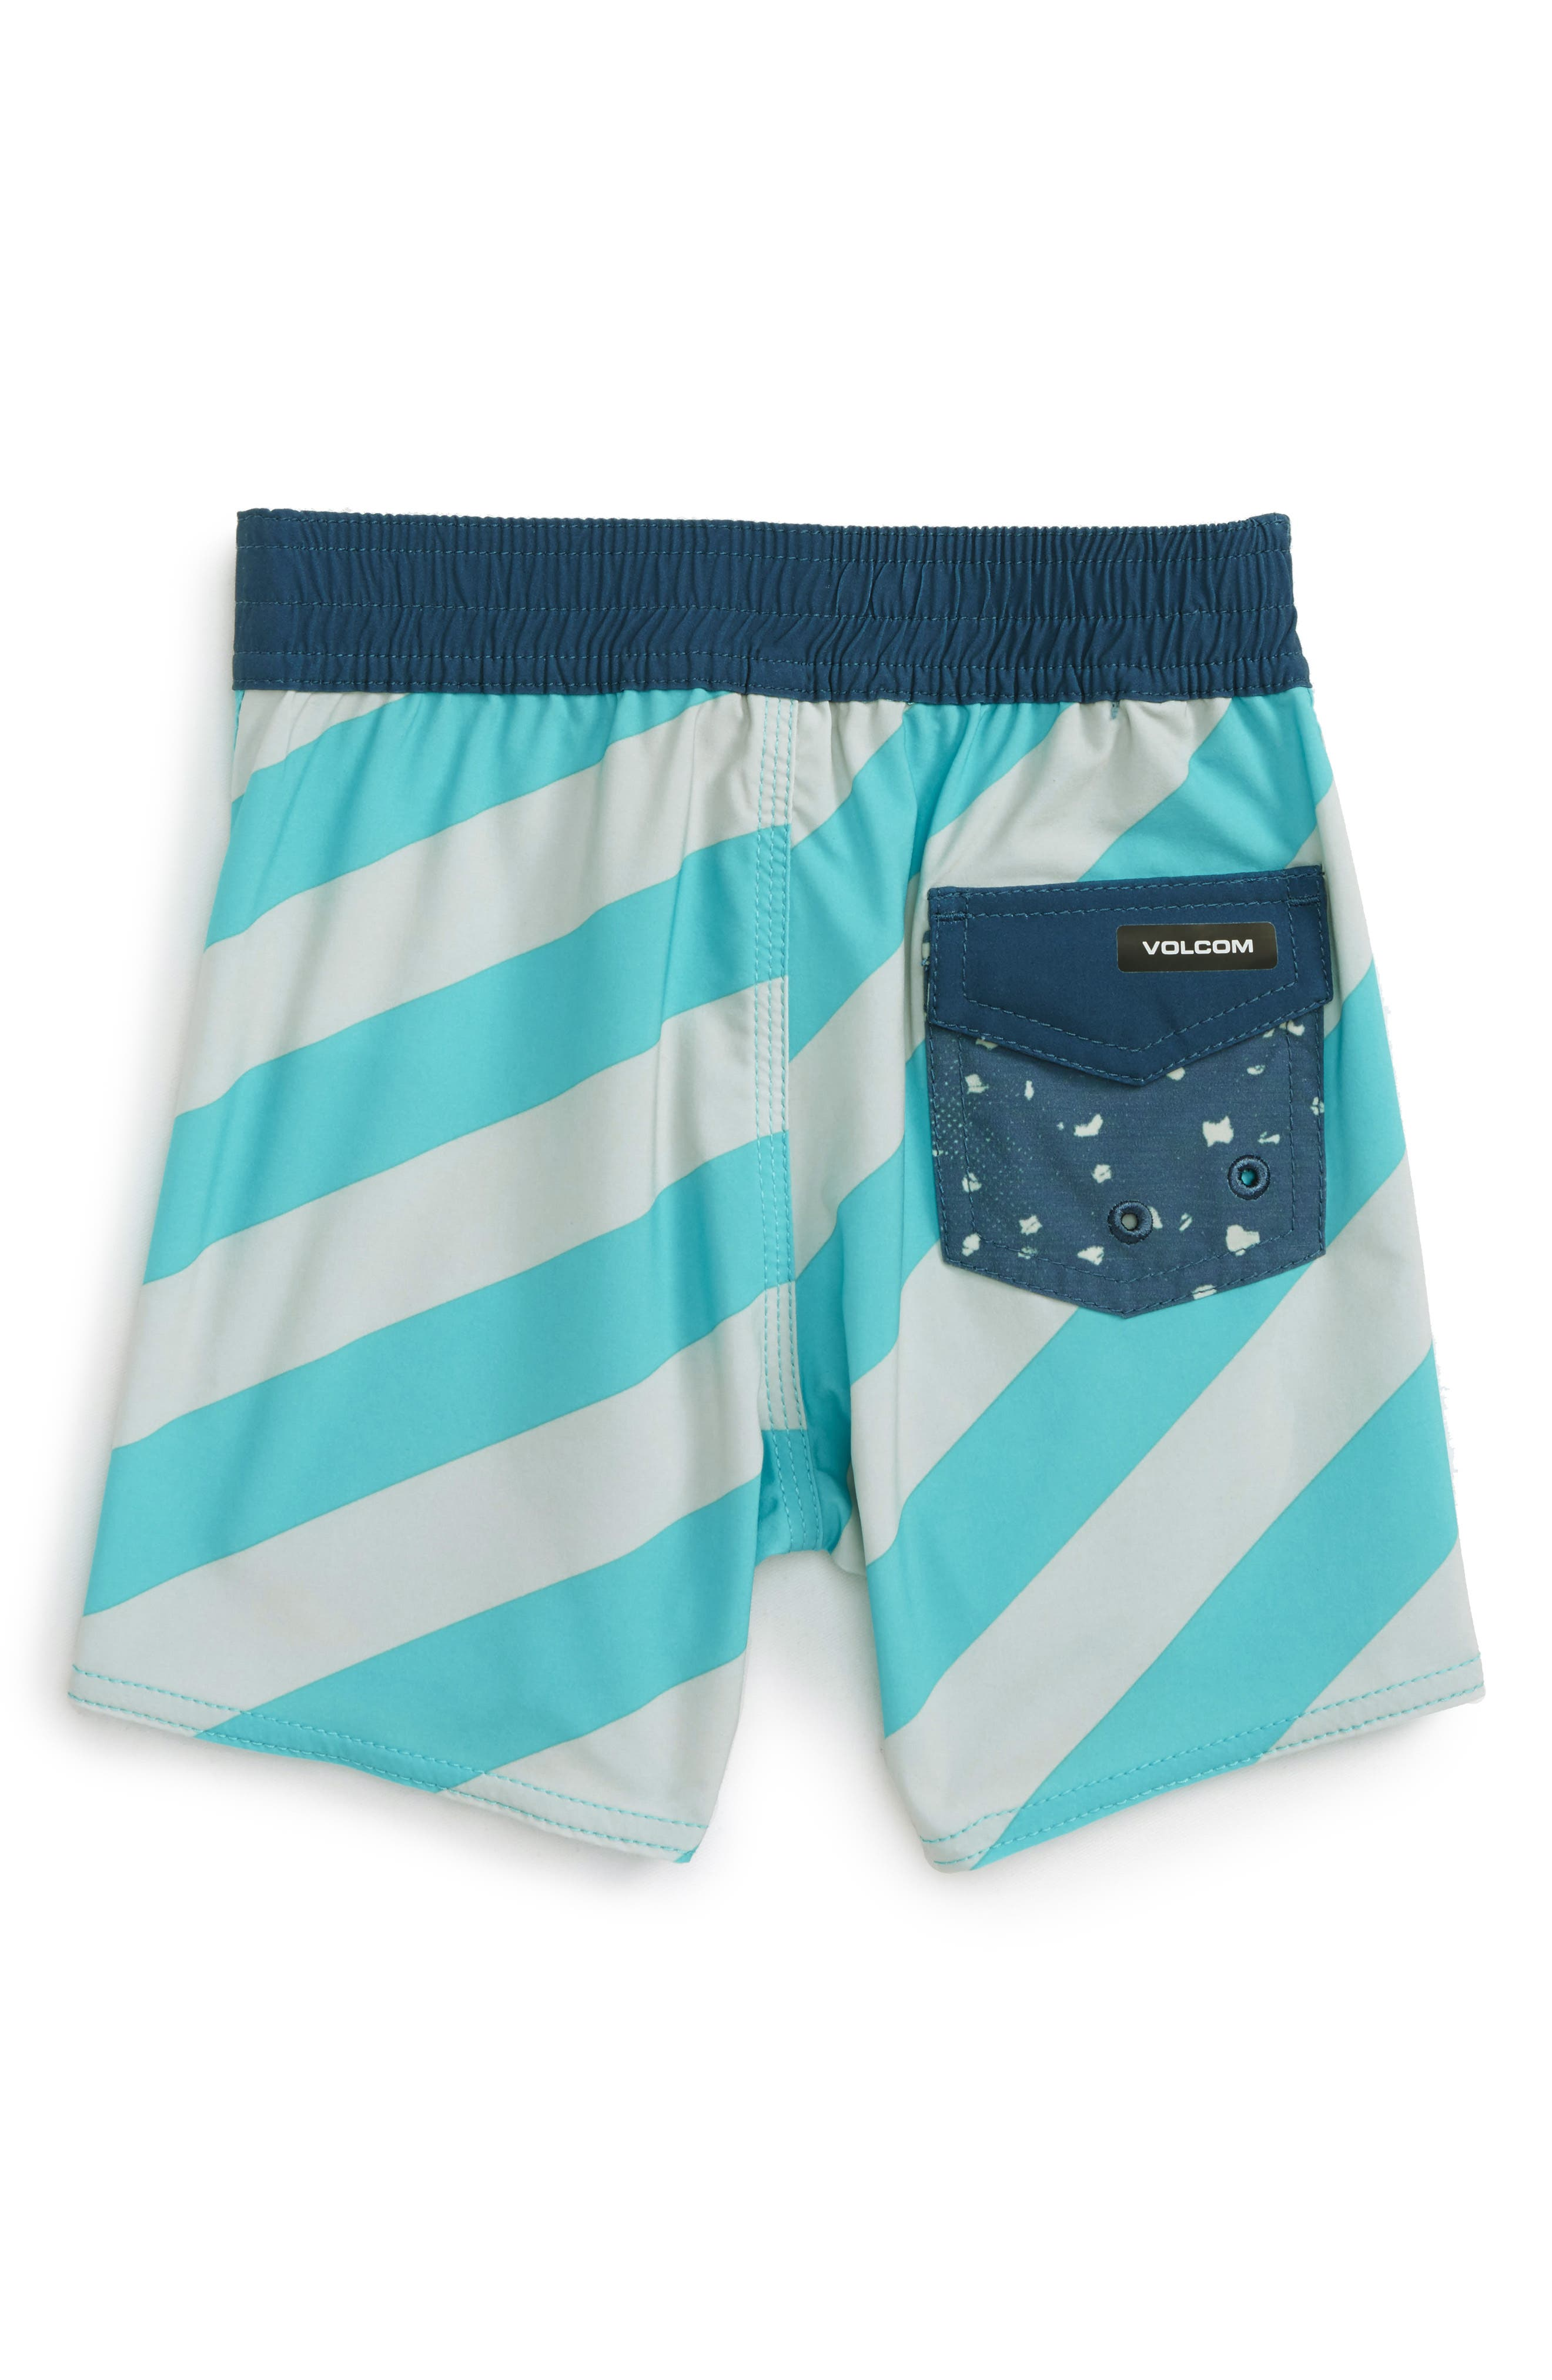 Stripey Jammer Board Shorts,                             Alternate thumbnail 2, color,                             440